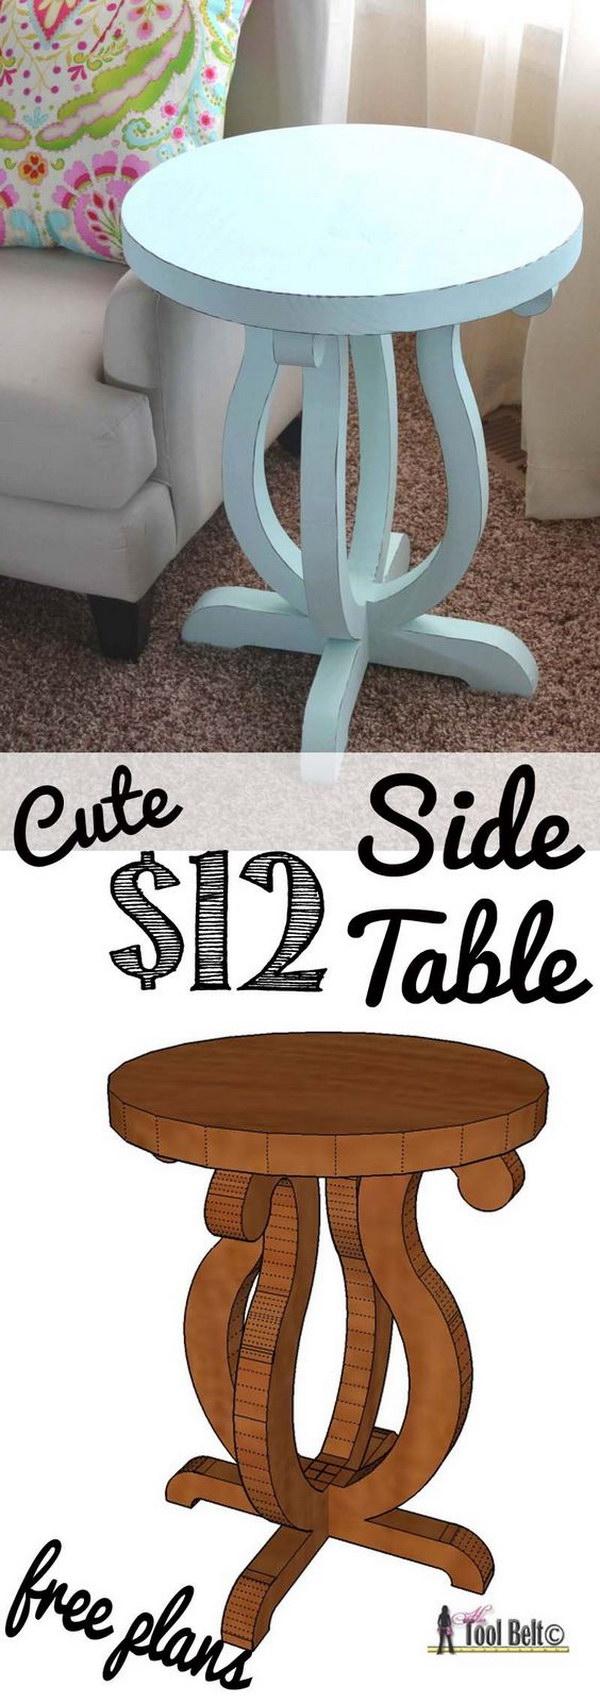 1-diy-side-table-ideas